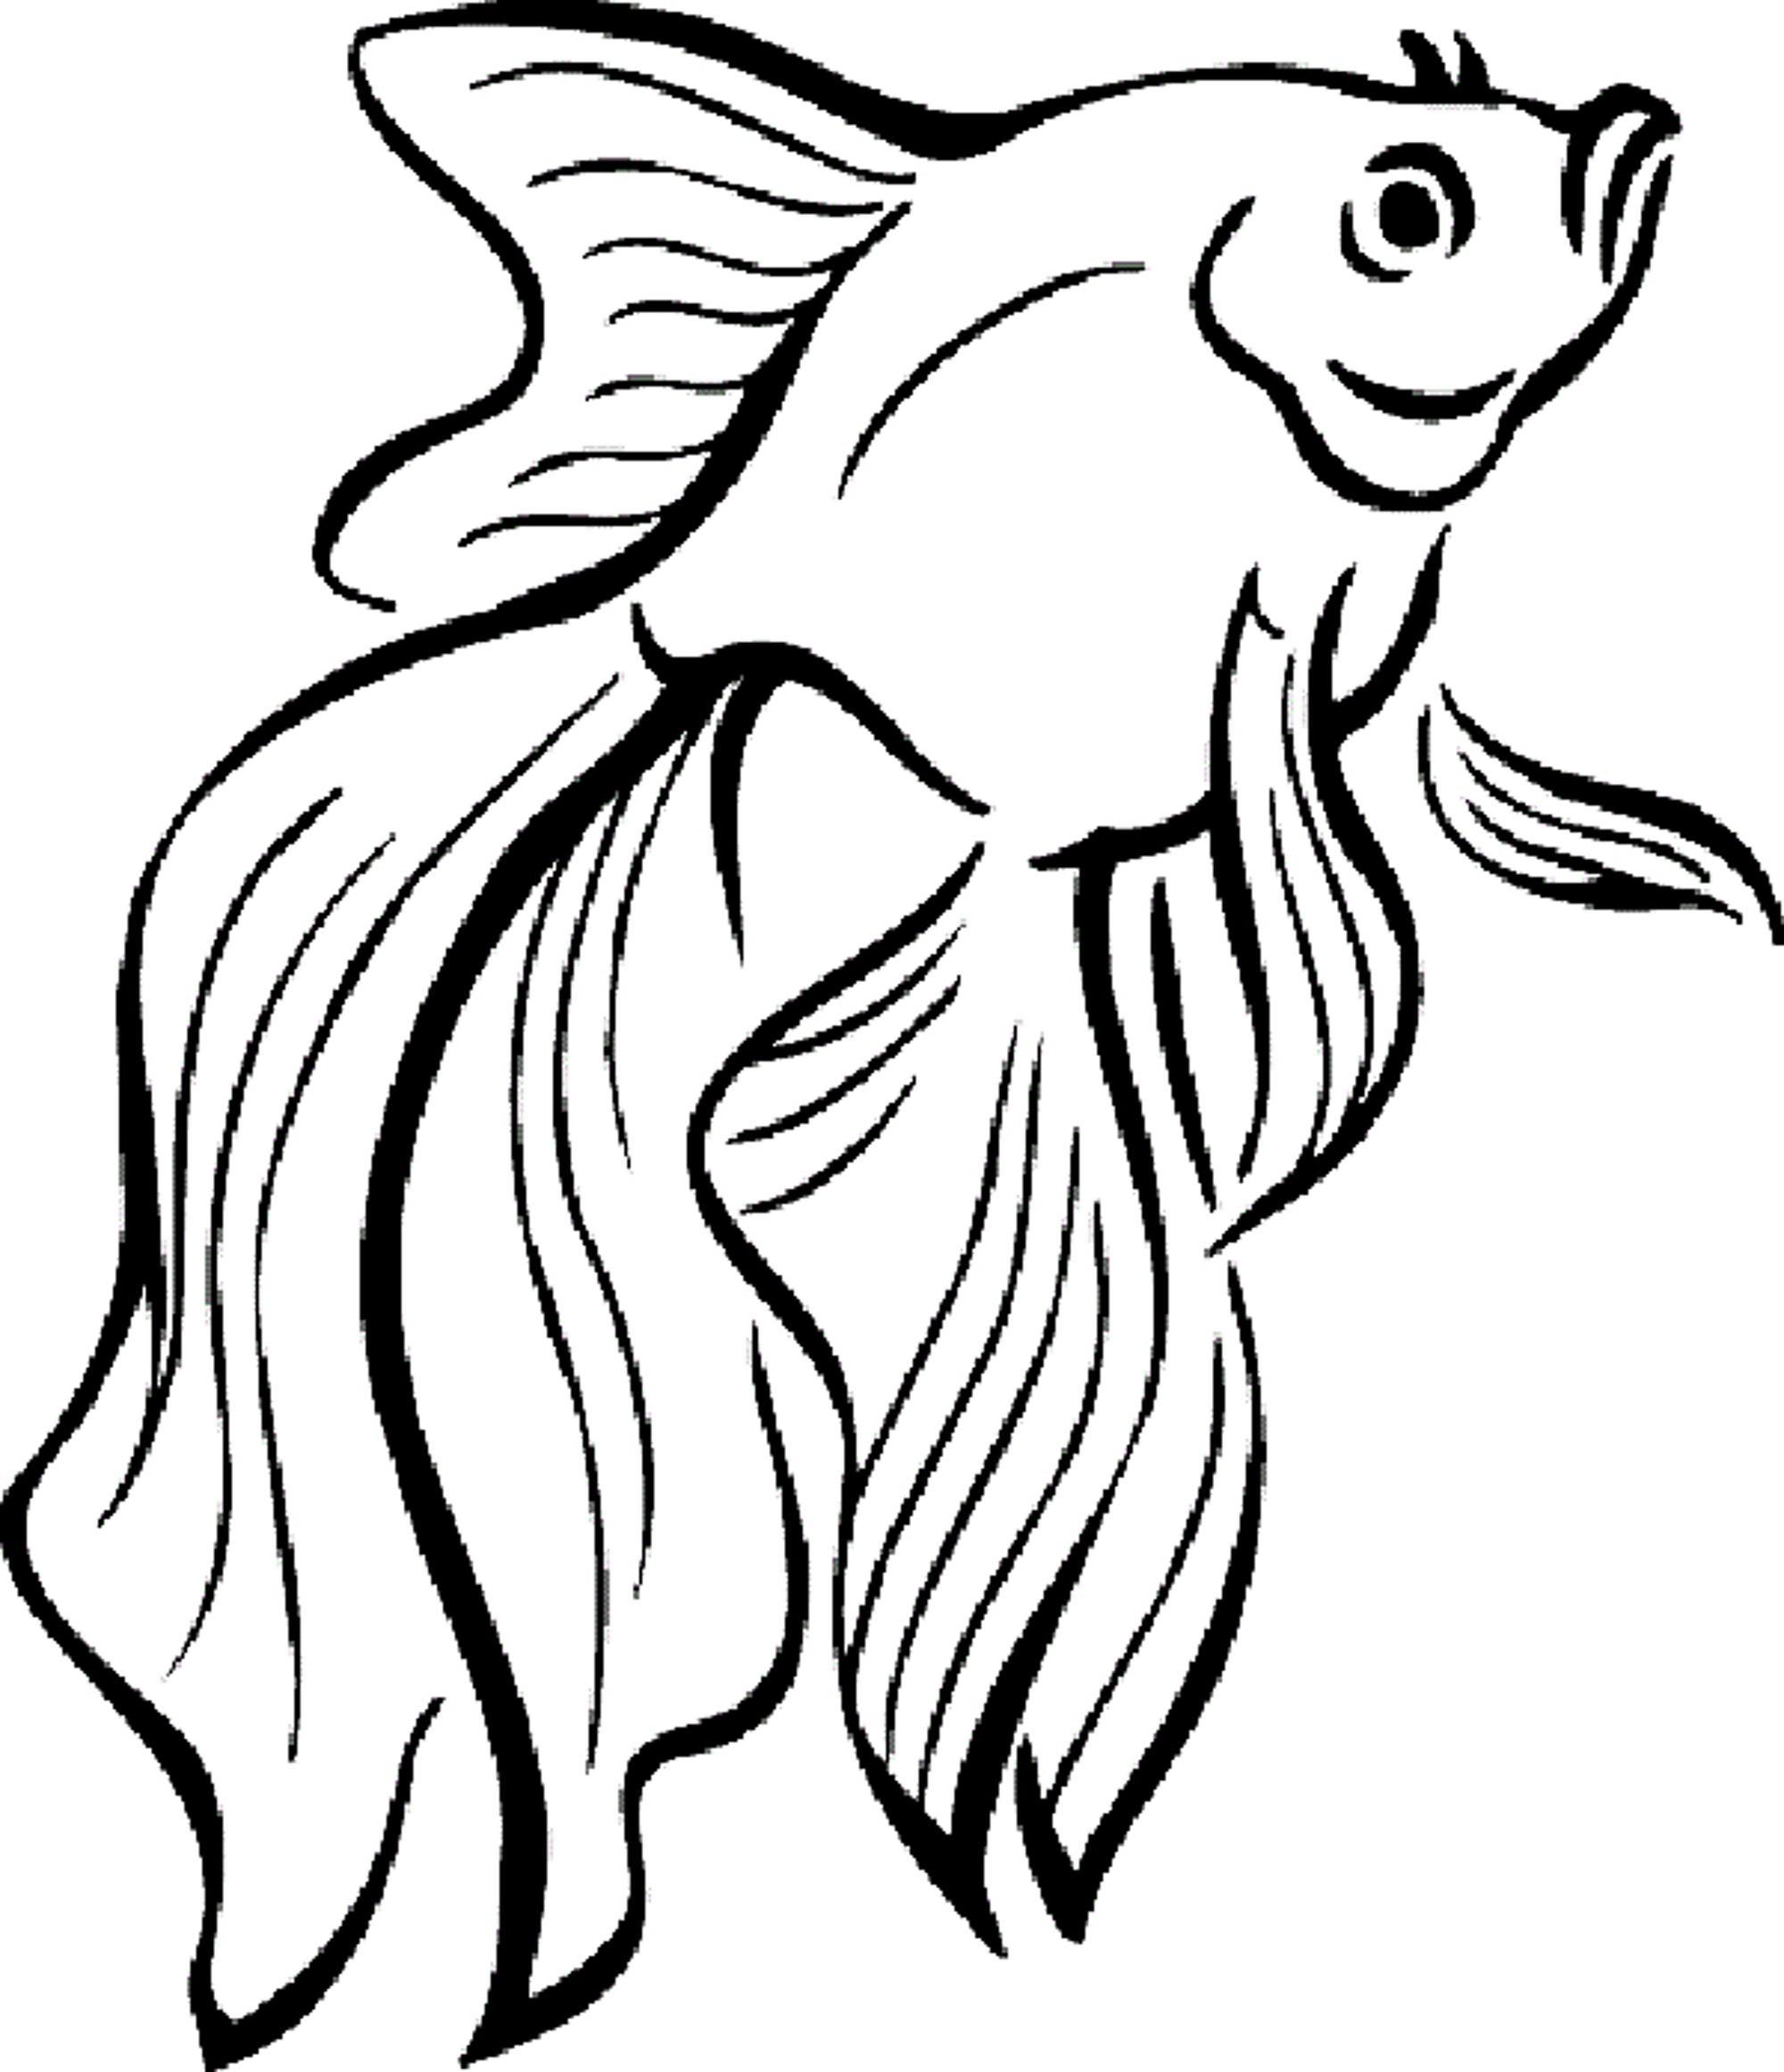 Fishbowl Drawing At Getdrawings Com Free For Personal Use Fishbowl